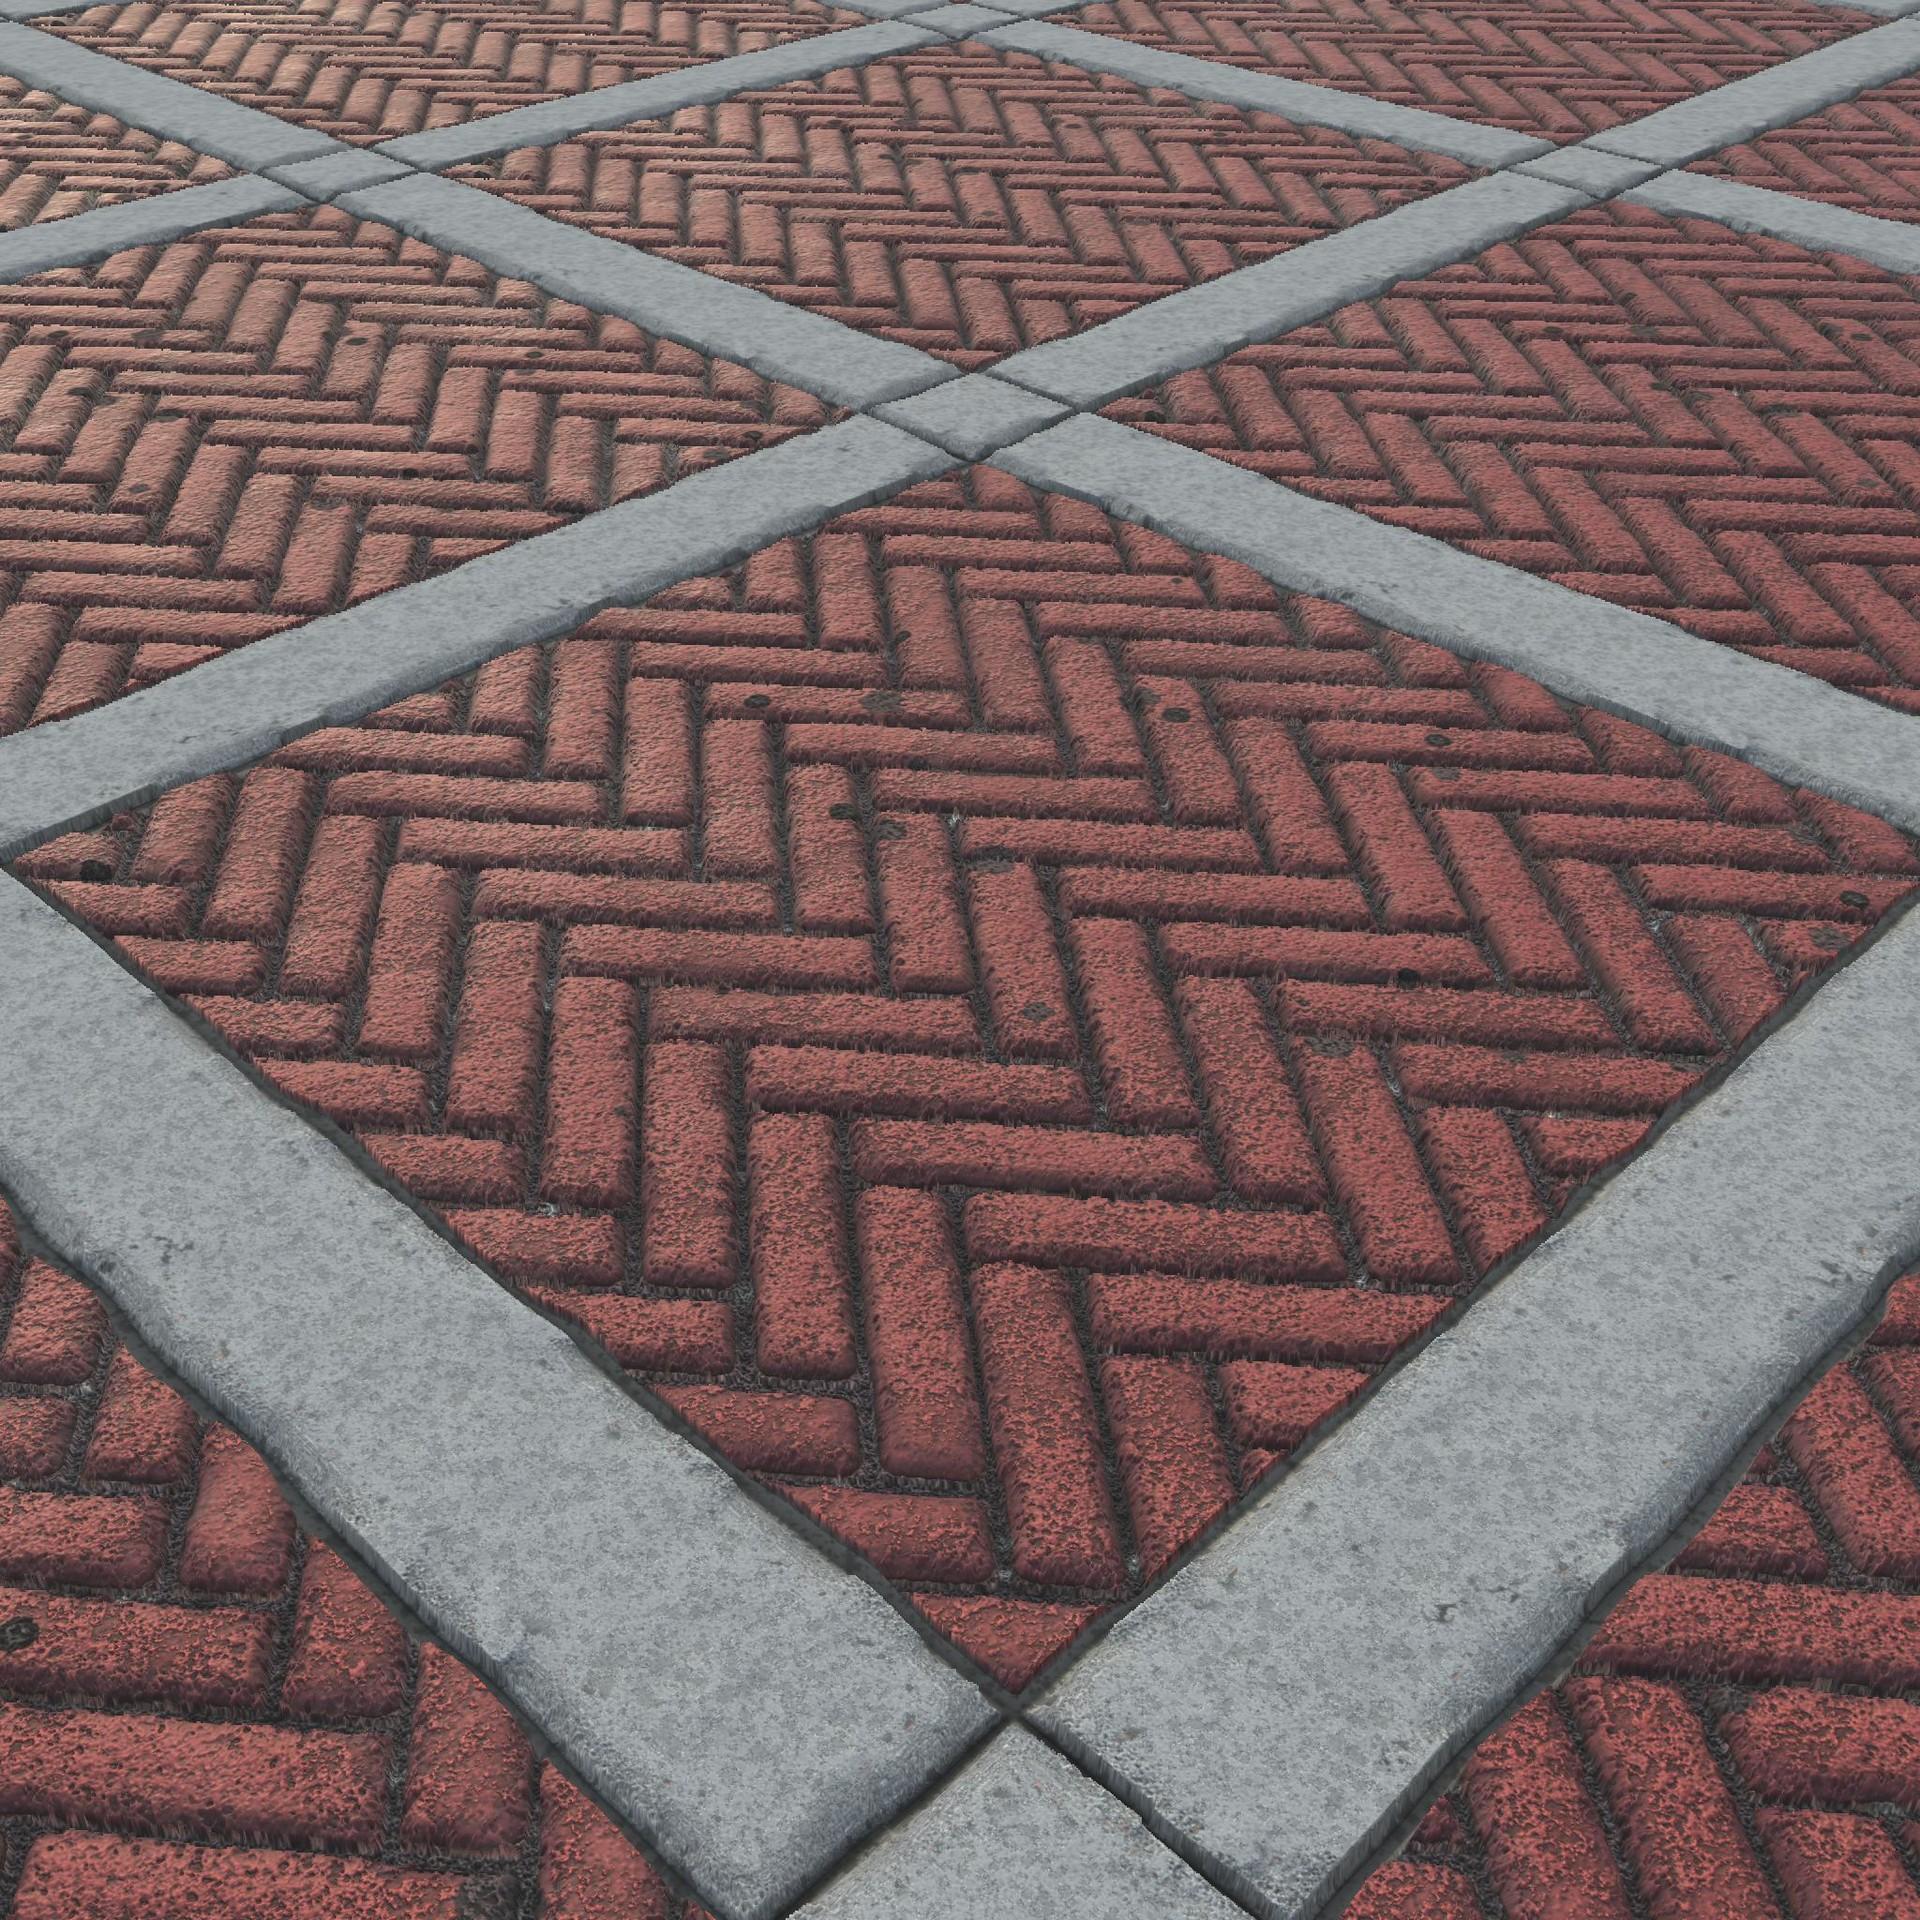 James ray sidewalk 7